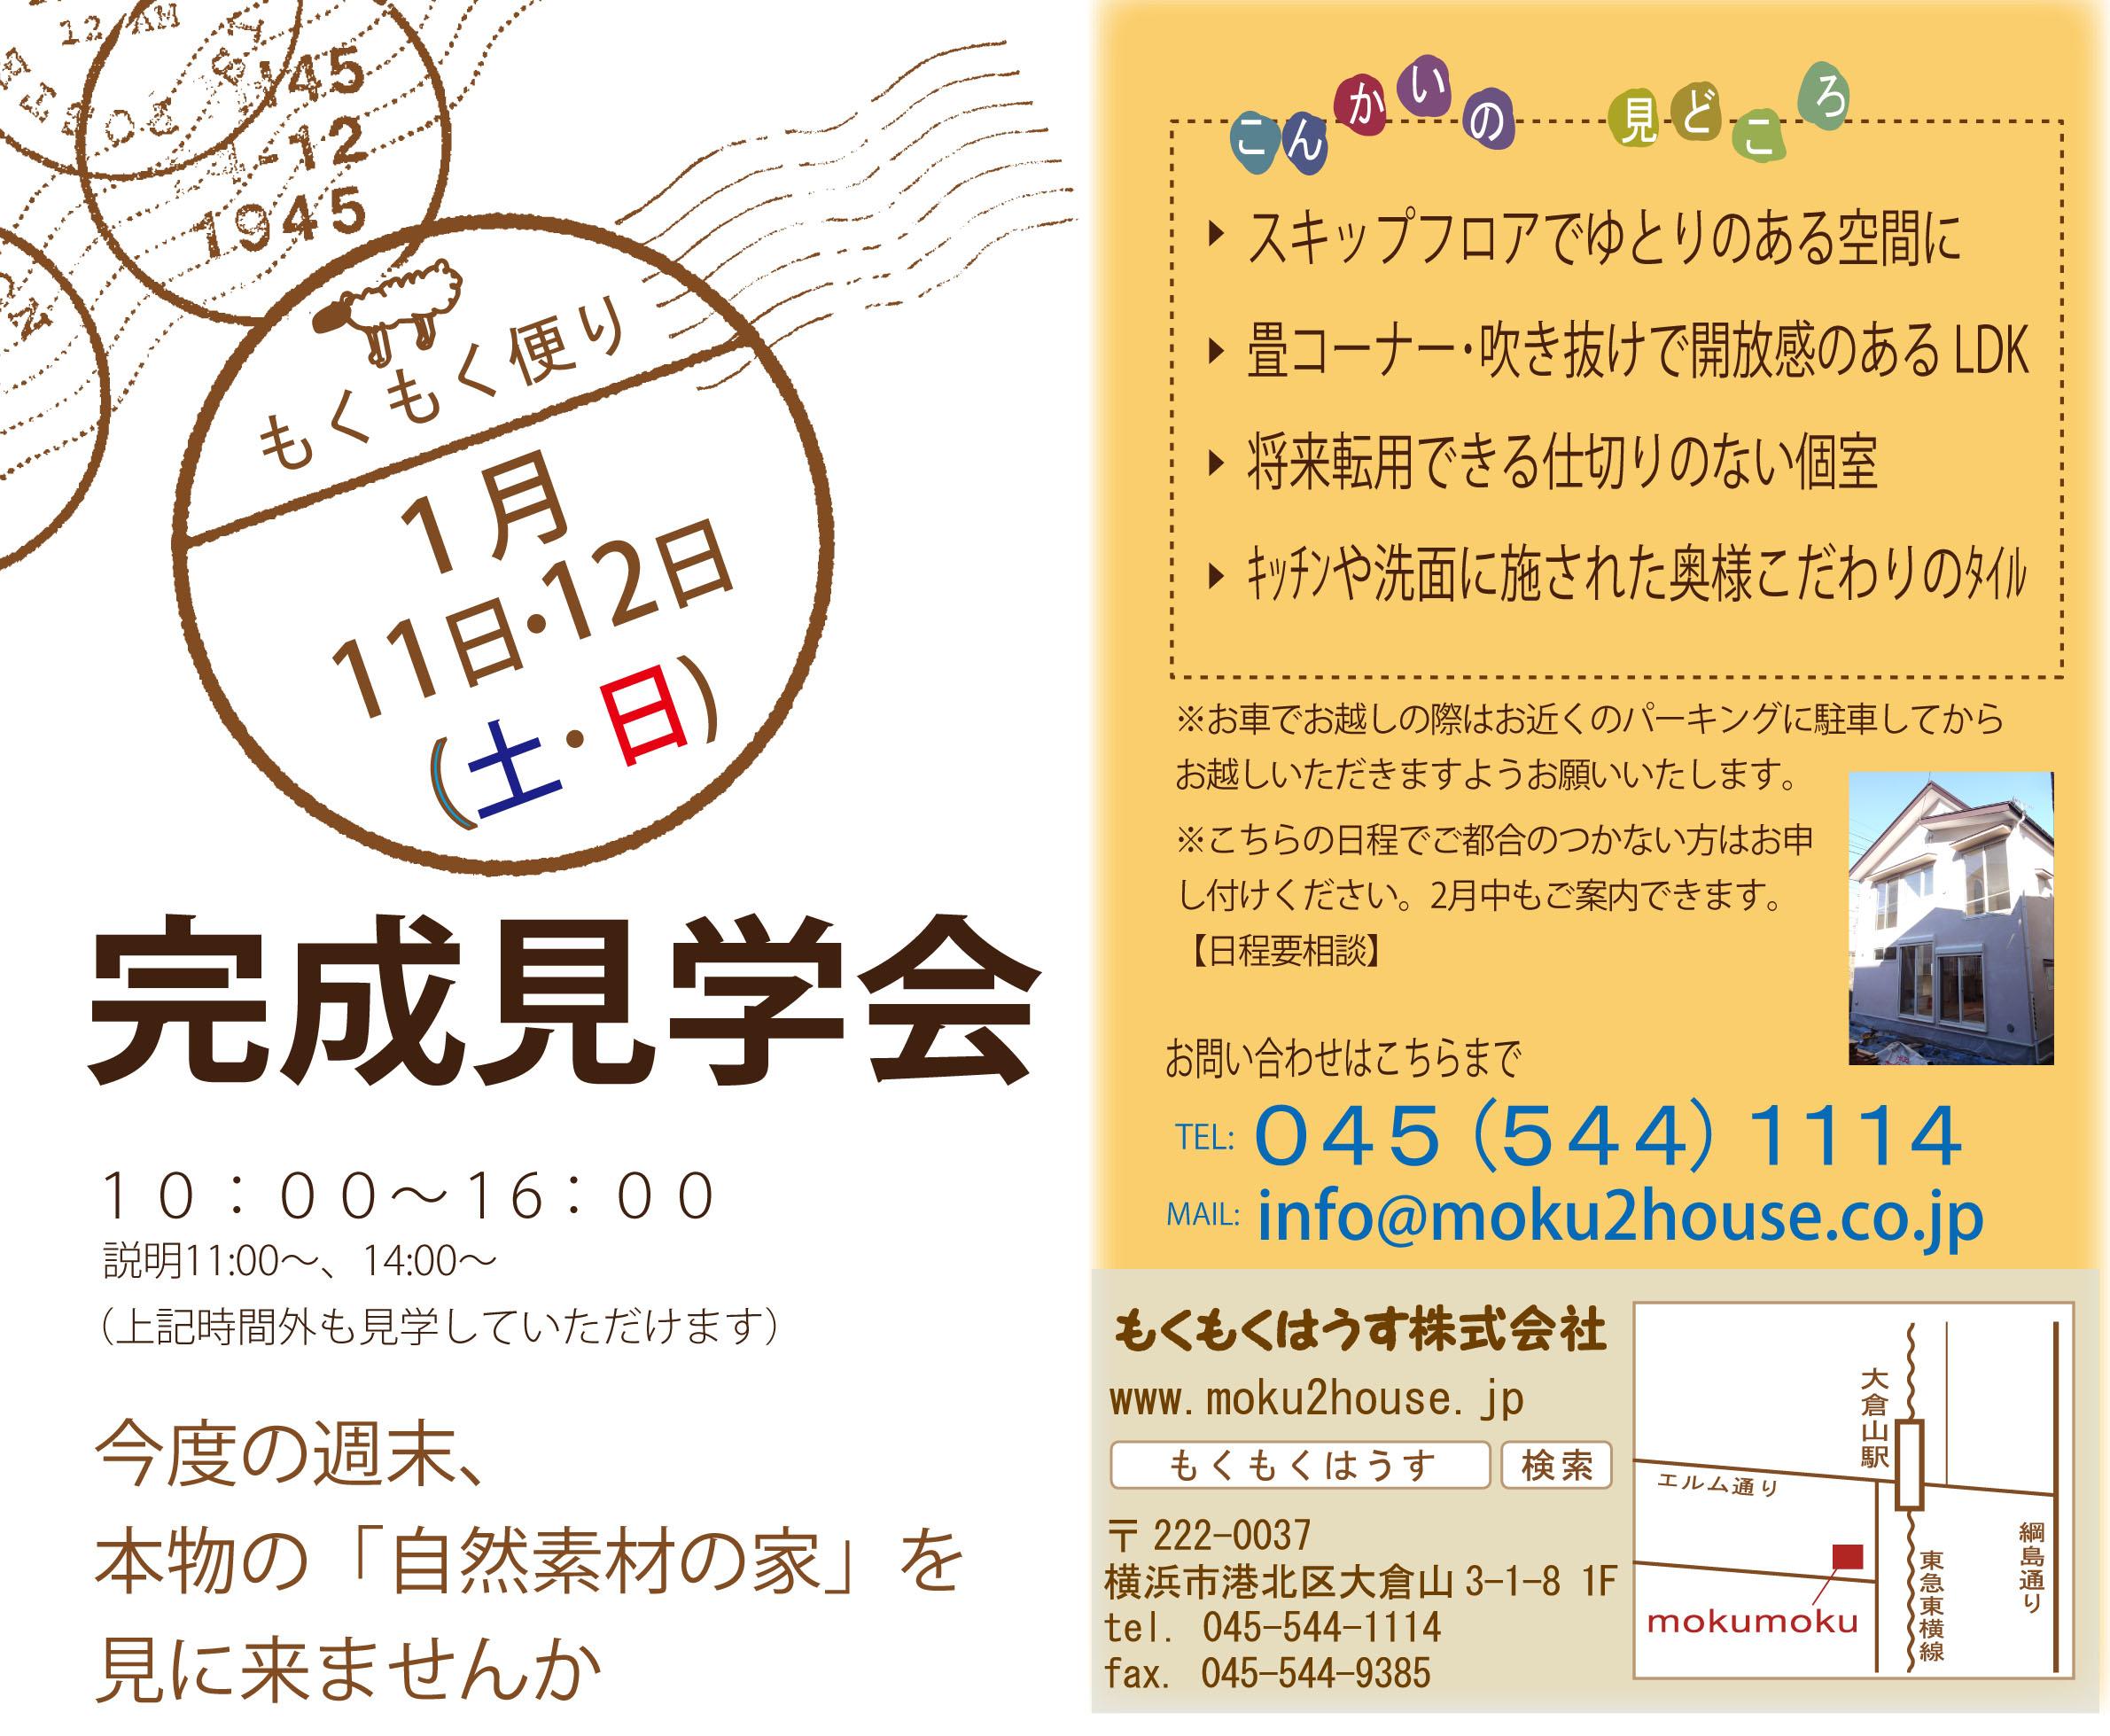 2511112kengakukai.jpg